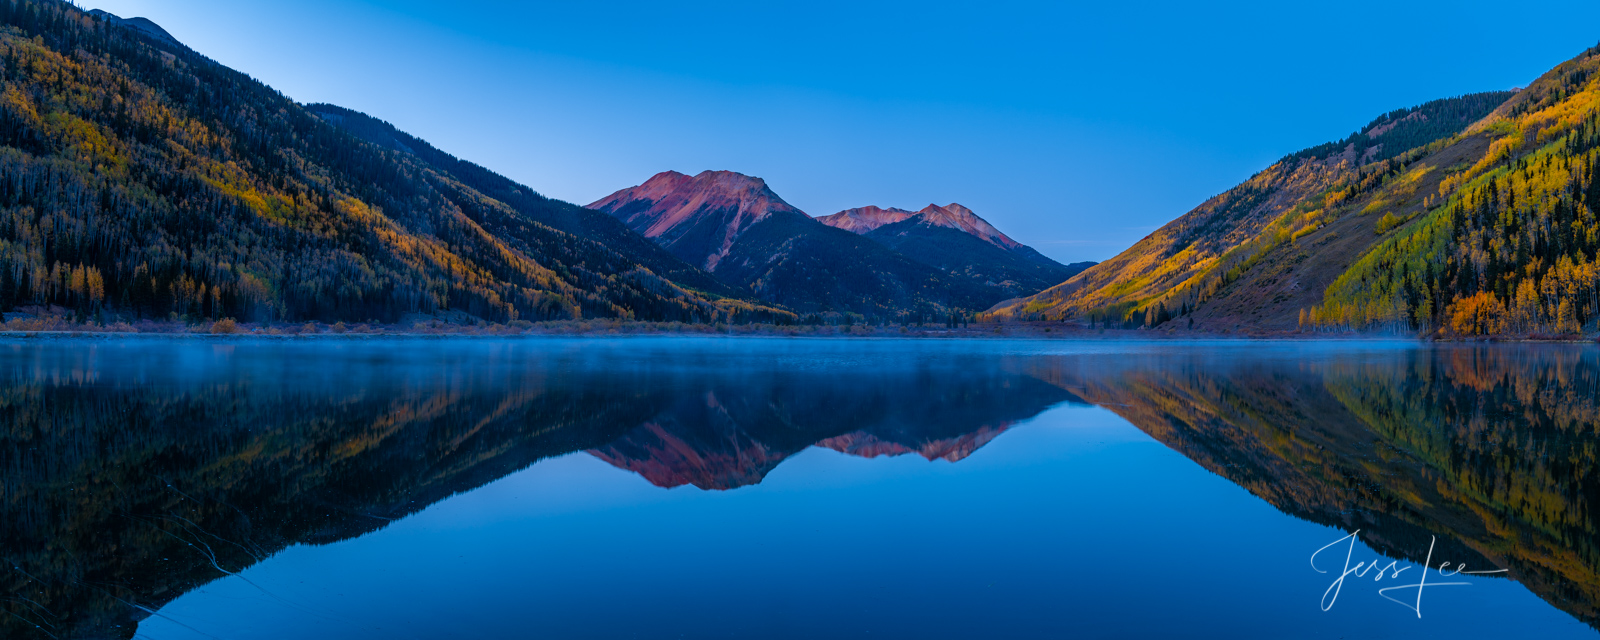 Blue Crystal Lake Print